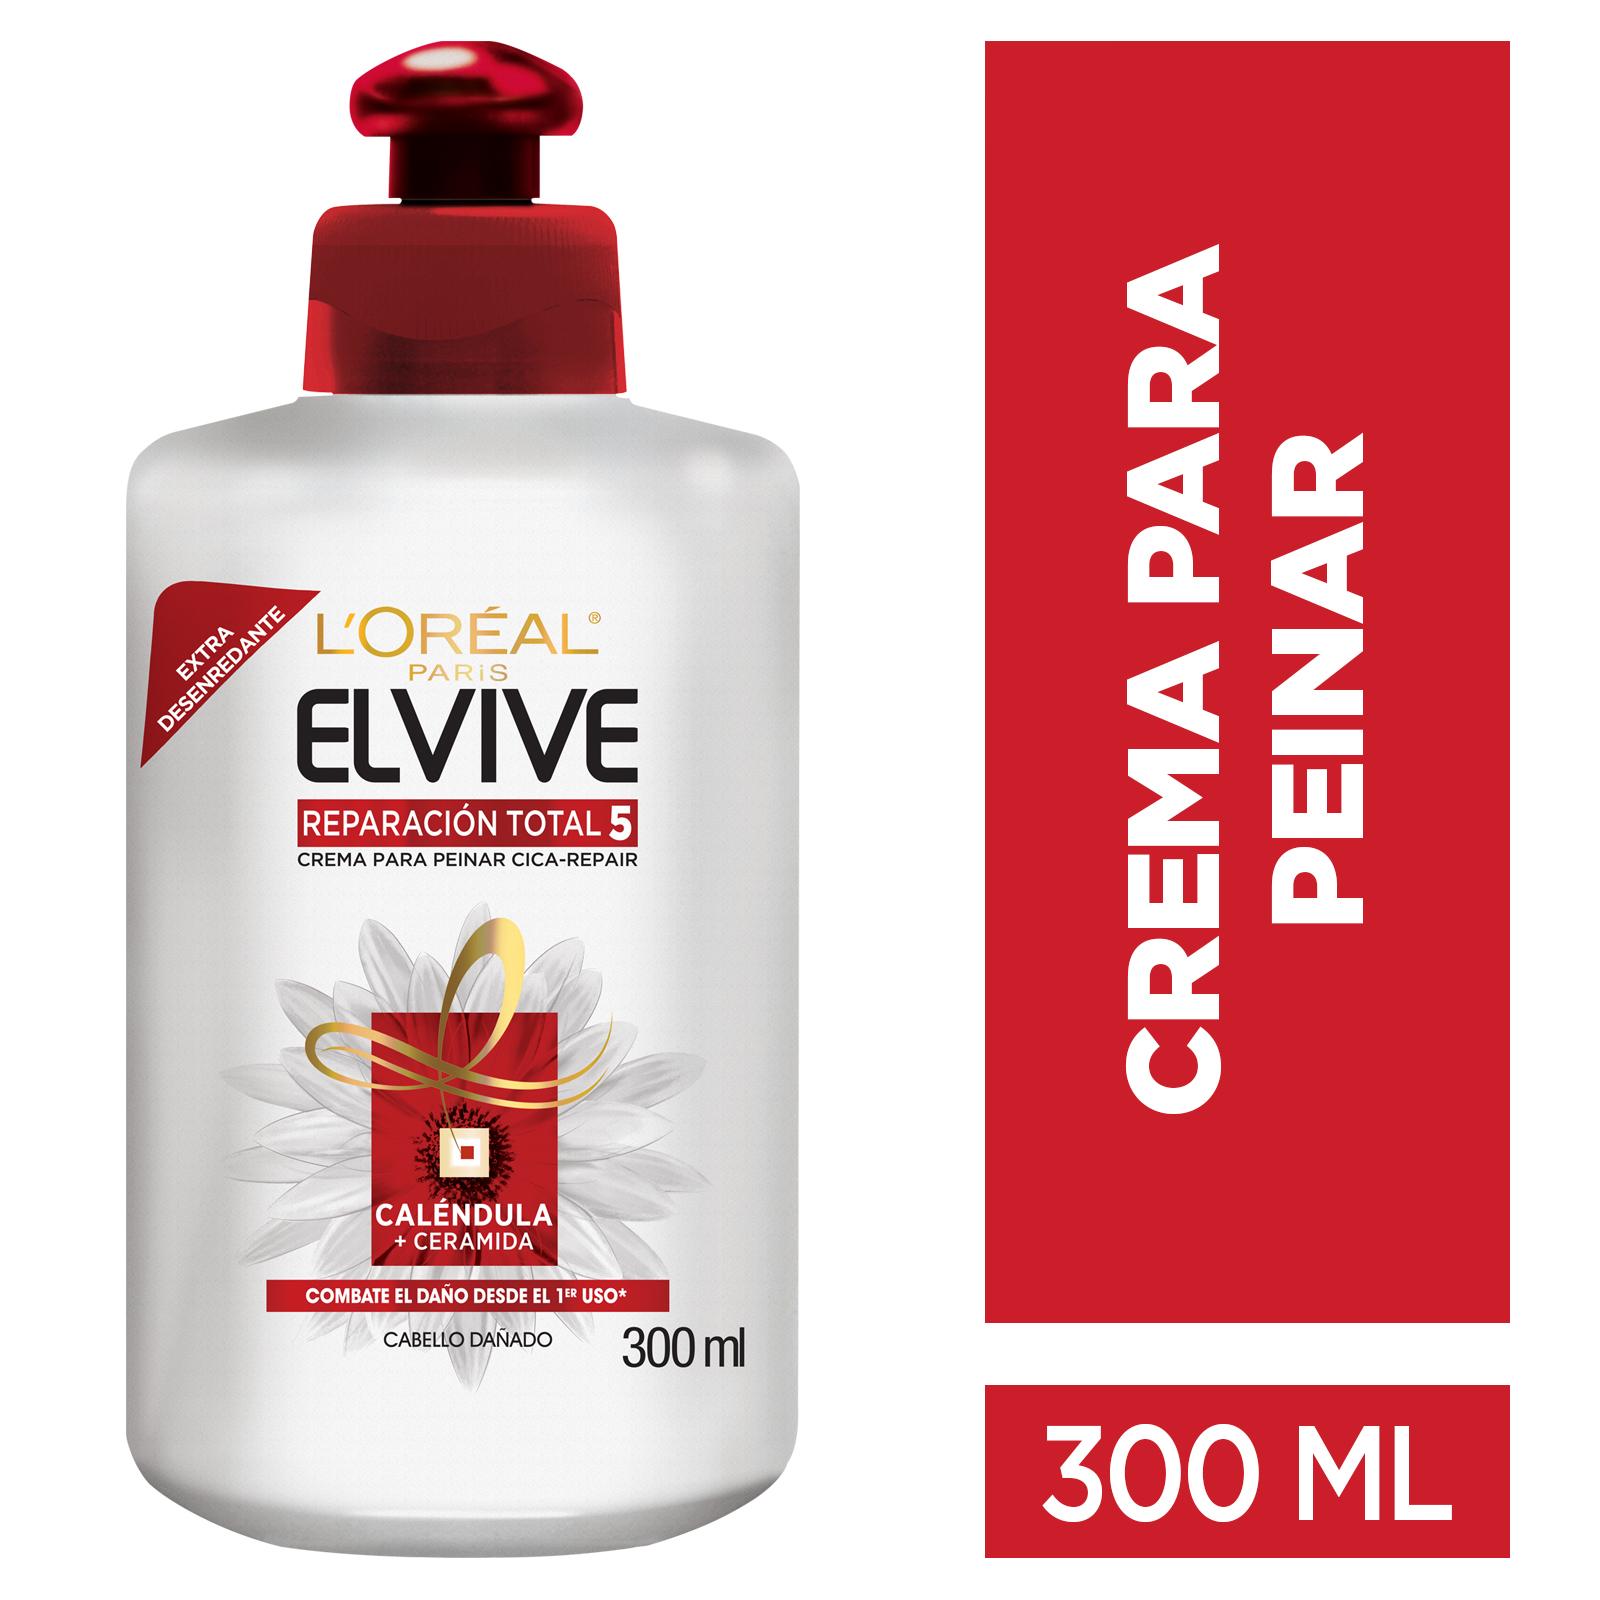 Crema Peinar Elvive Reparación Total 5 300ml